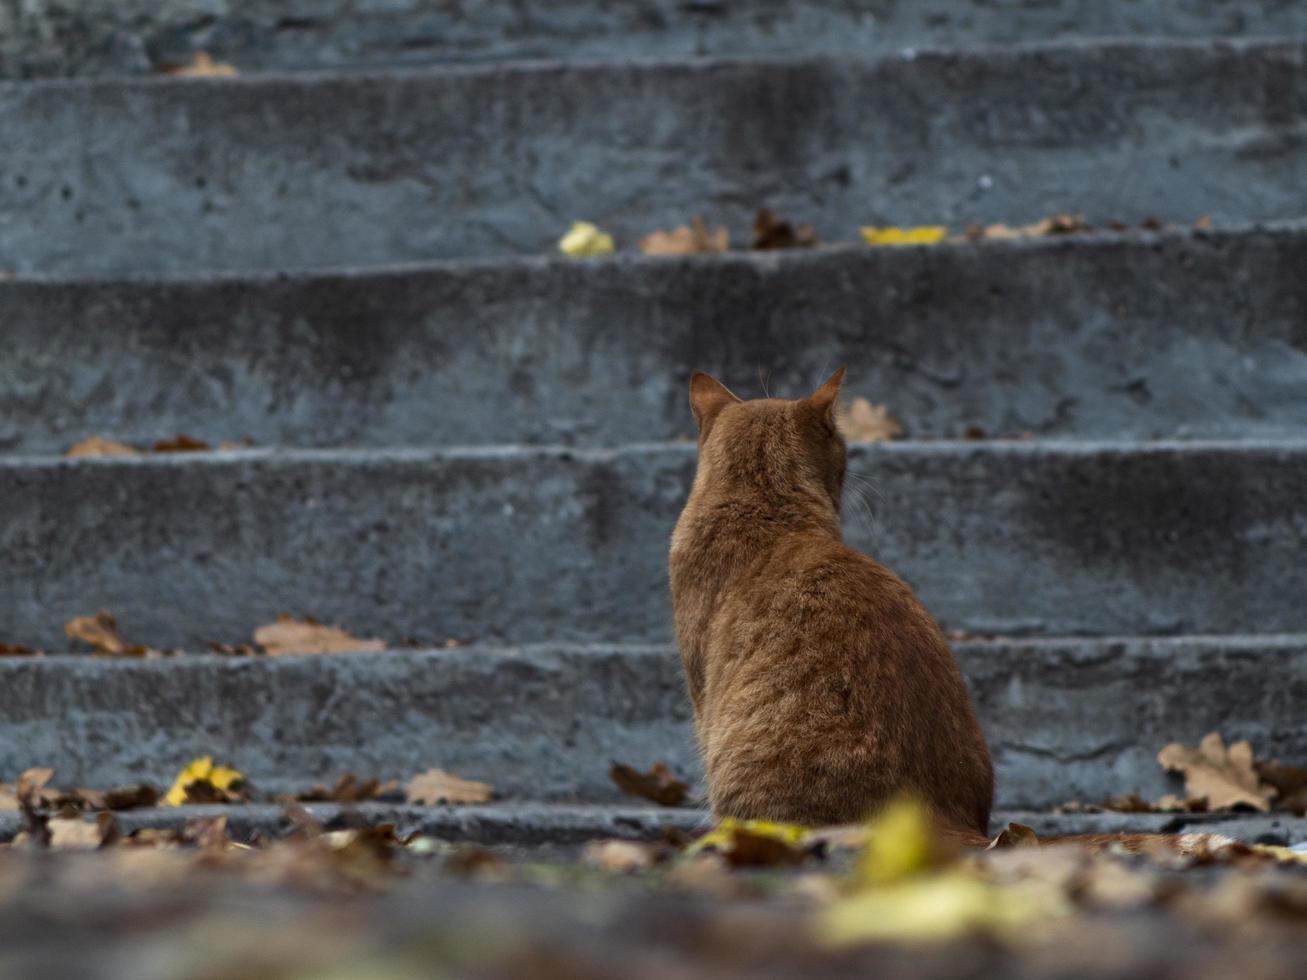 gato callejero en follaje otoñal foto